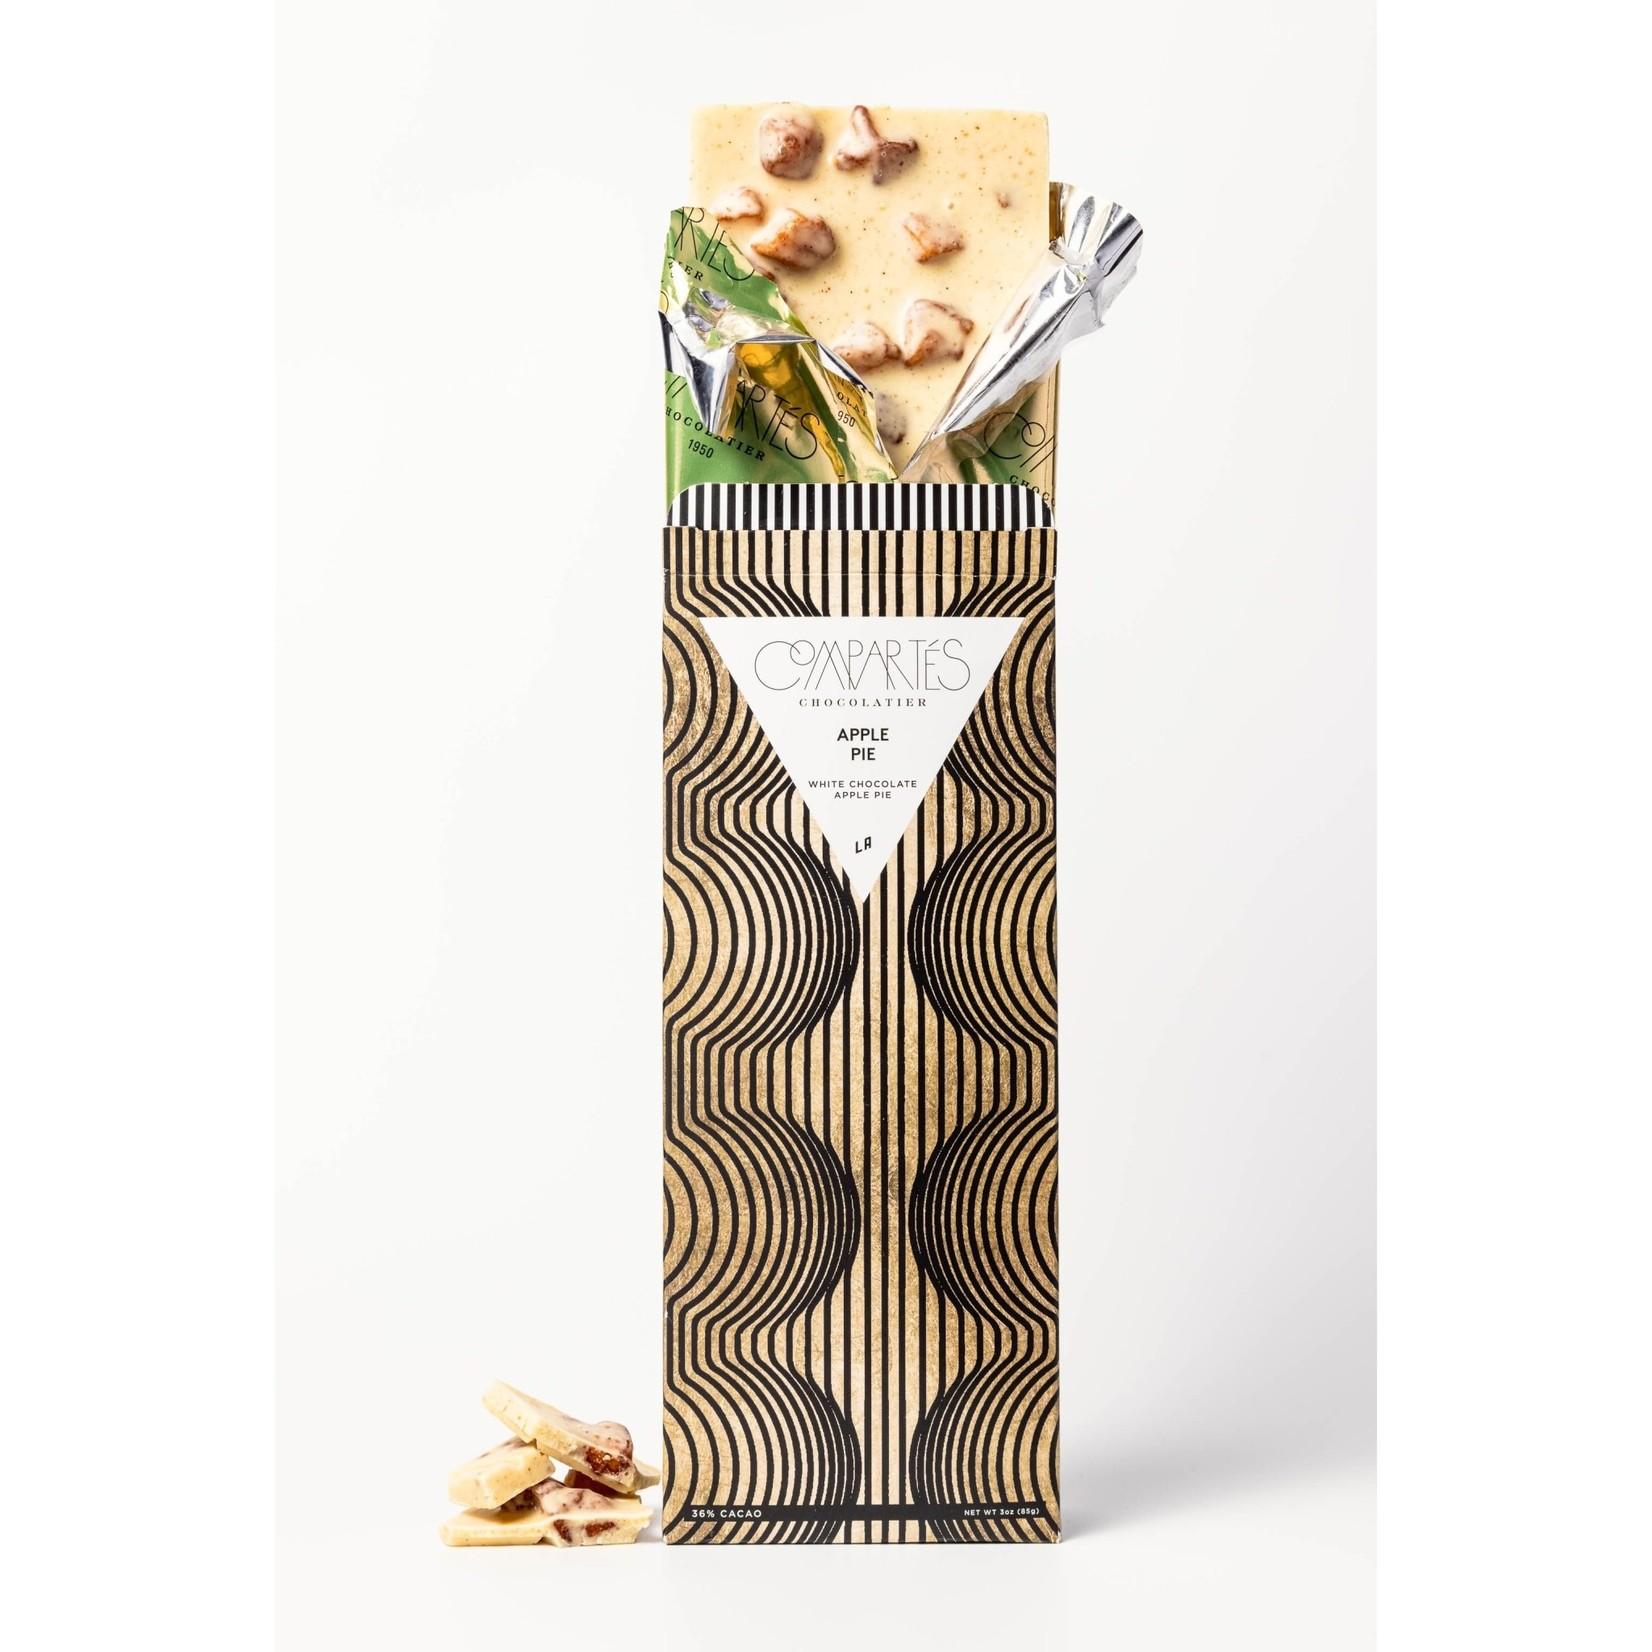 Compartes Chocolate Compartes Apple Pie Chocolate Bar